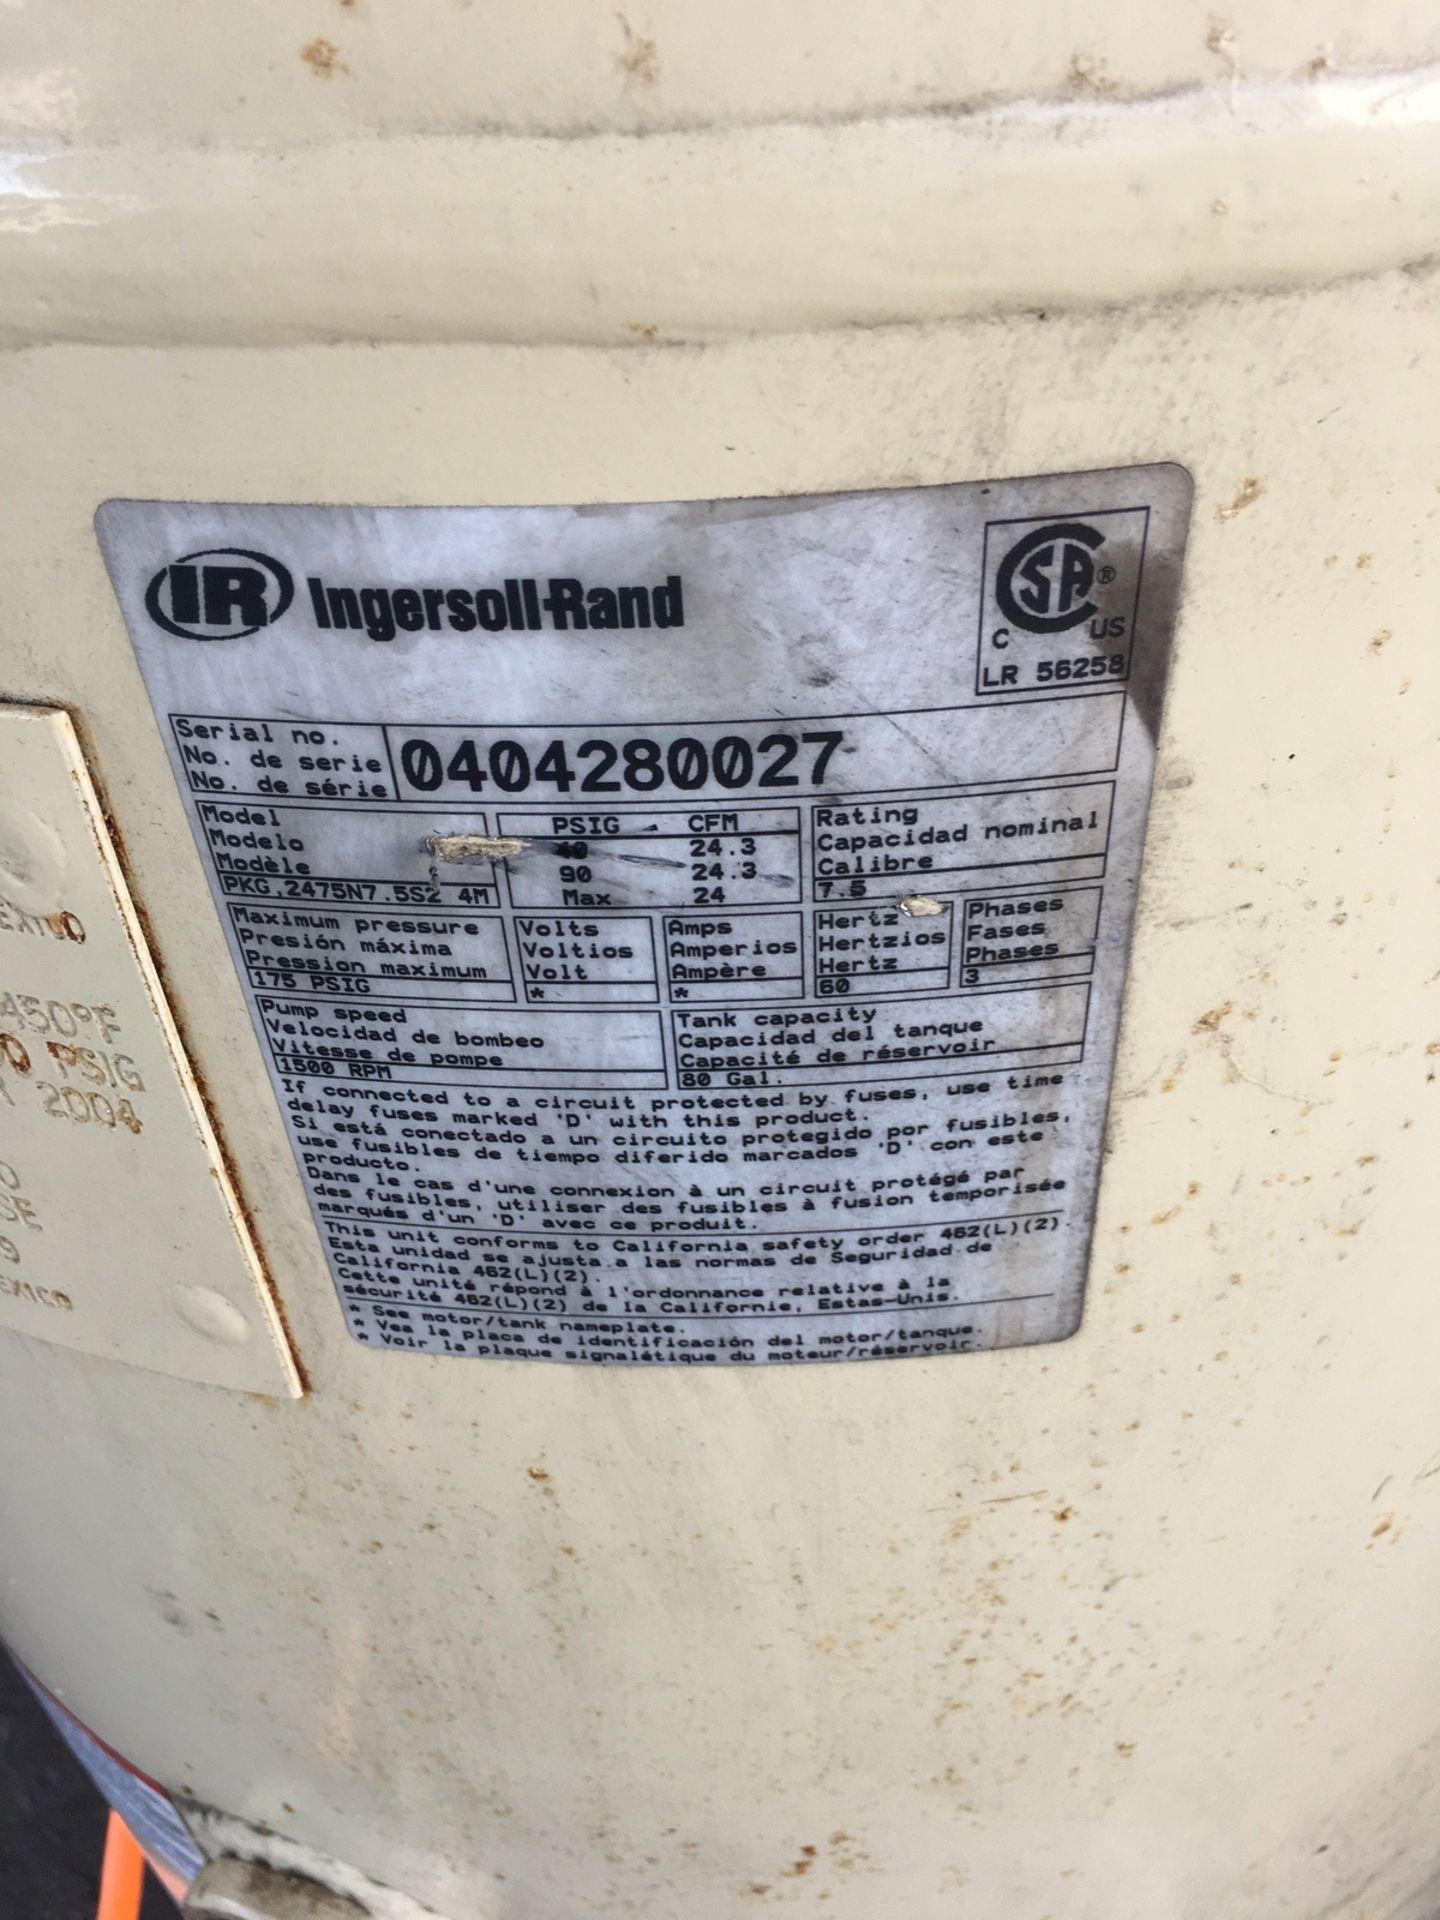 Lot 54 - Ingersoll Rand Model 2475 Reciprocating Compressor, 24 CFM, Max 175 PSIG, 80 Ga   Rig Fee: No Charge